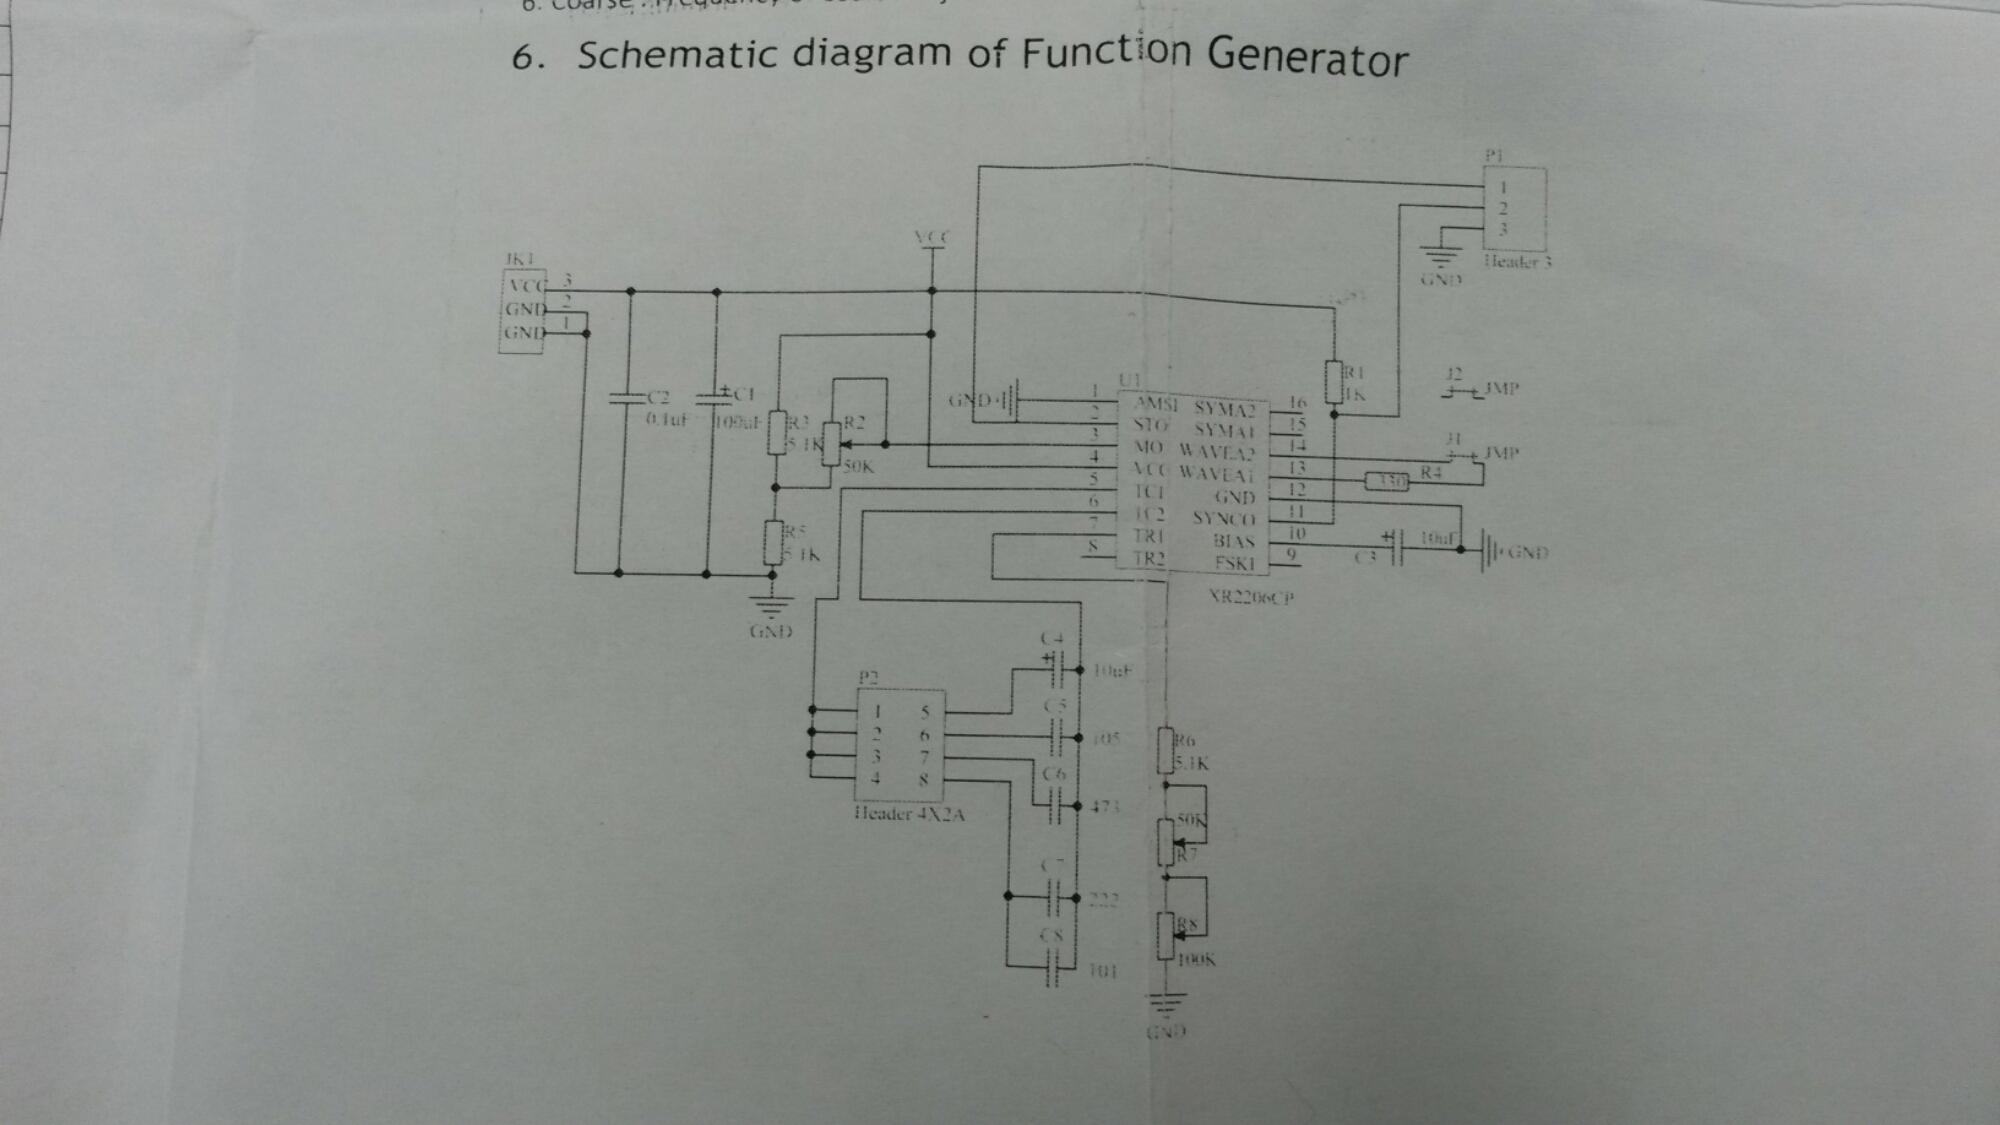 Function Generator Kit Simple Circuit Electronic Circuits And Diagram